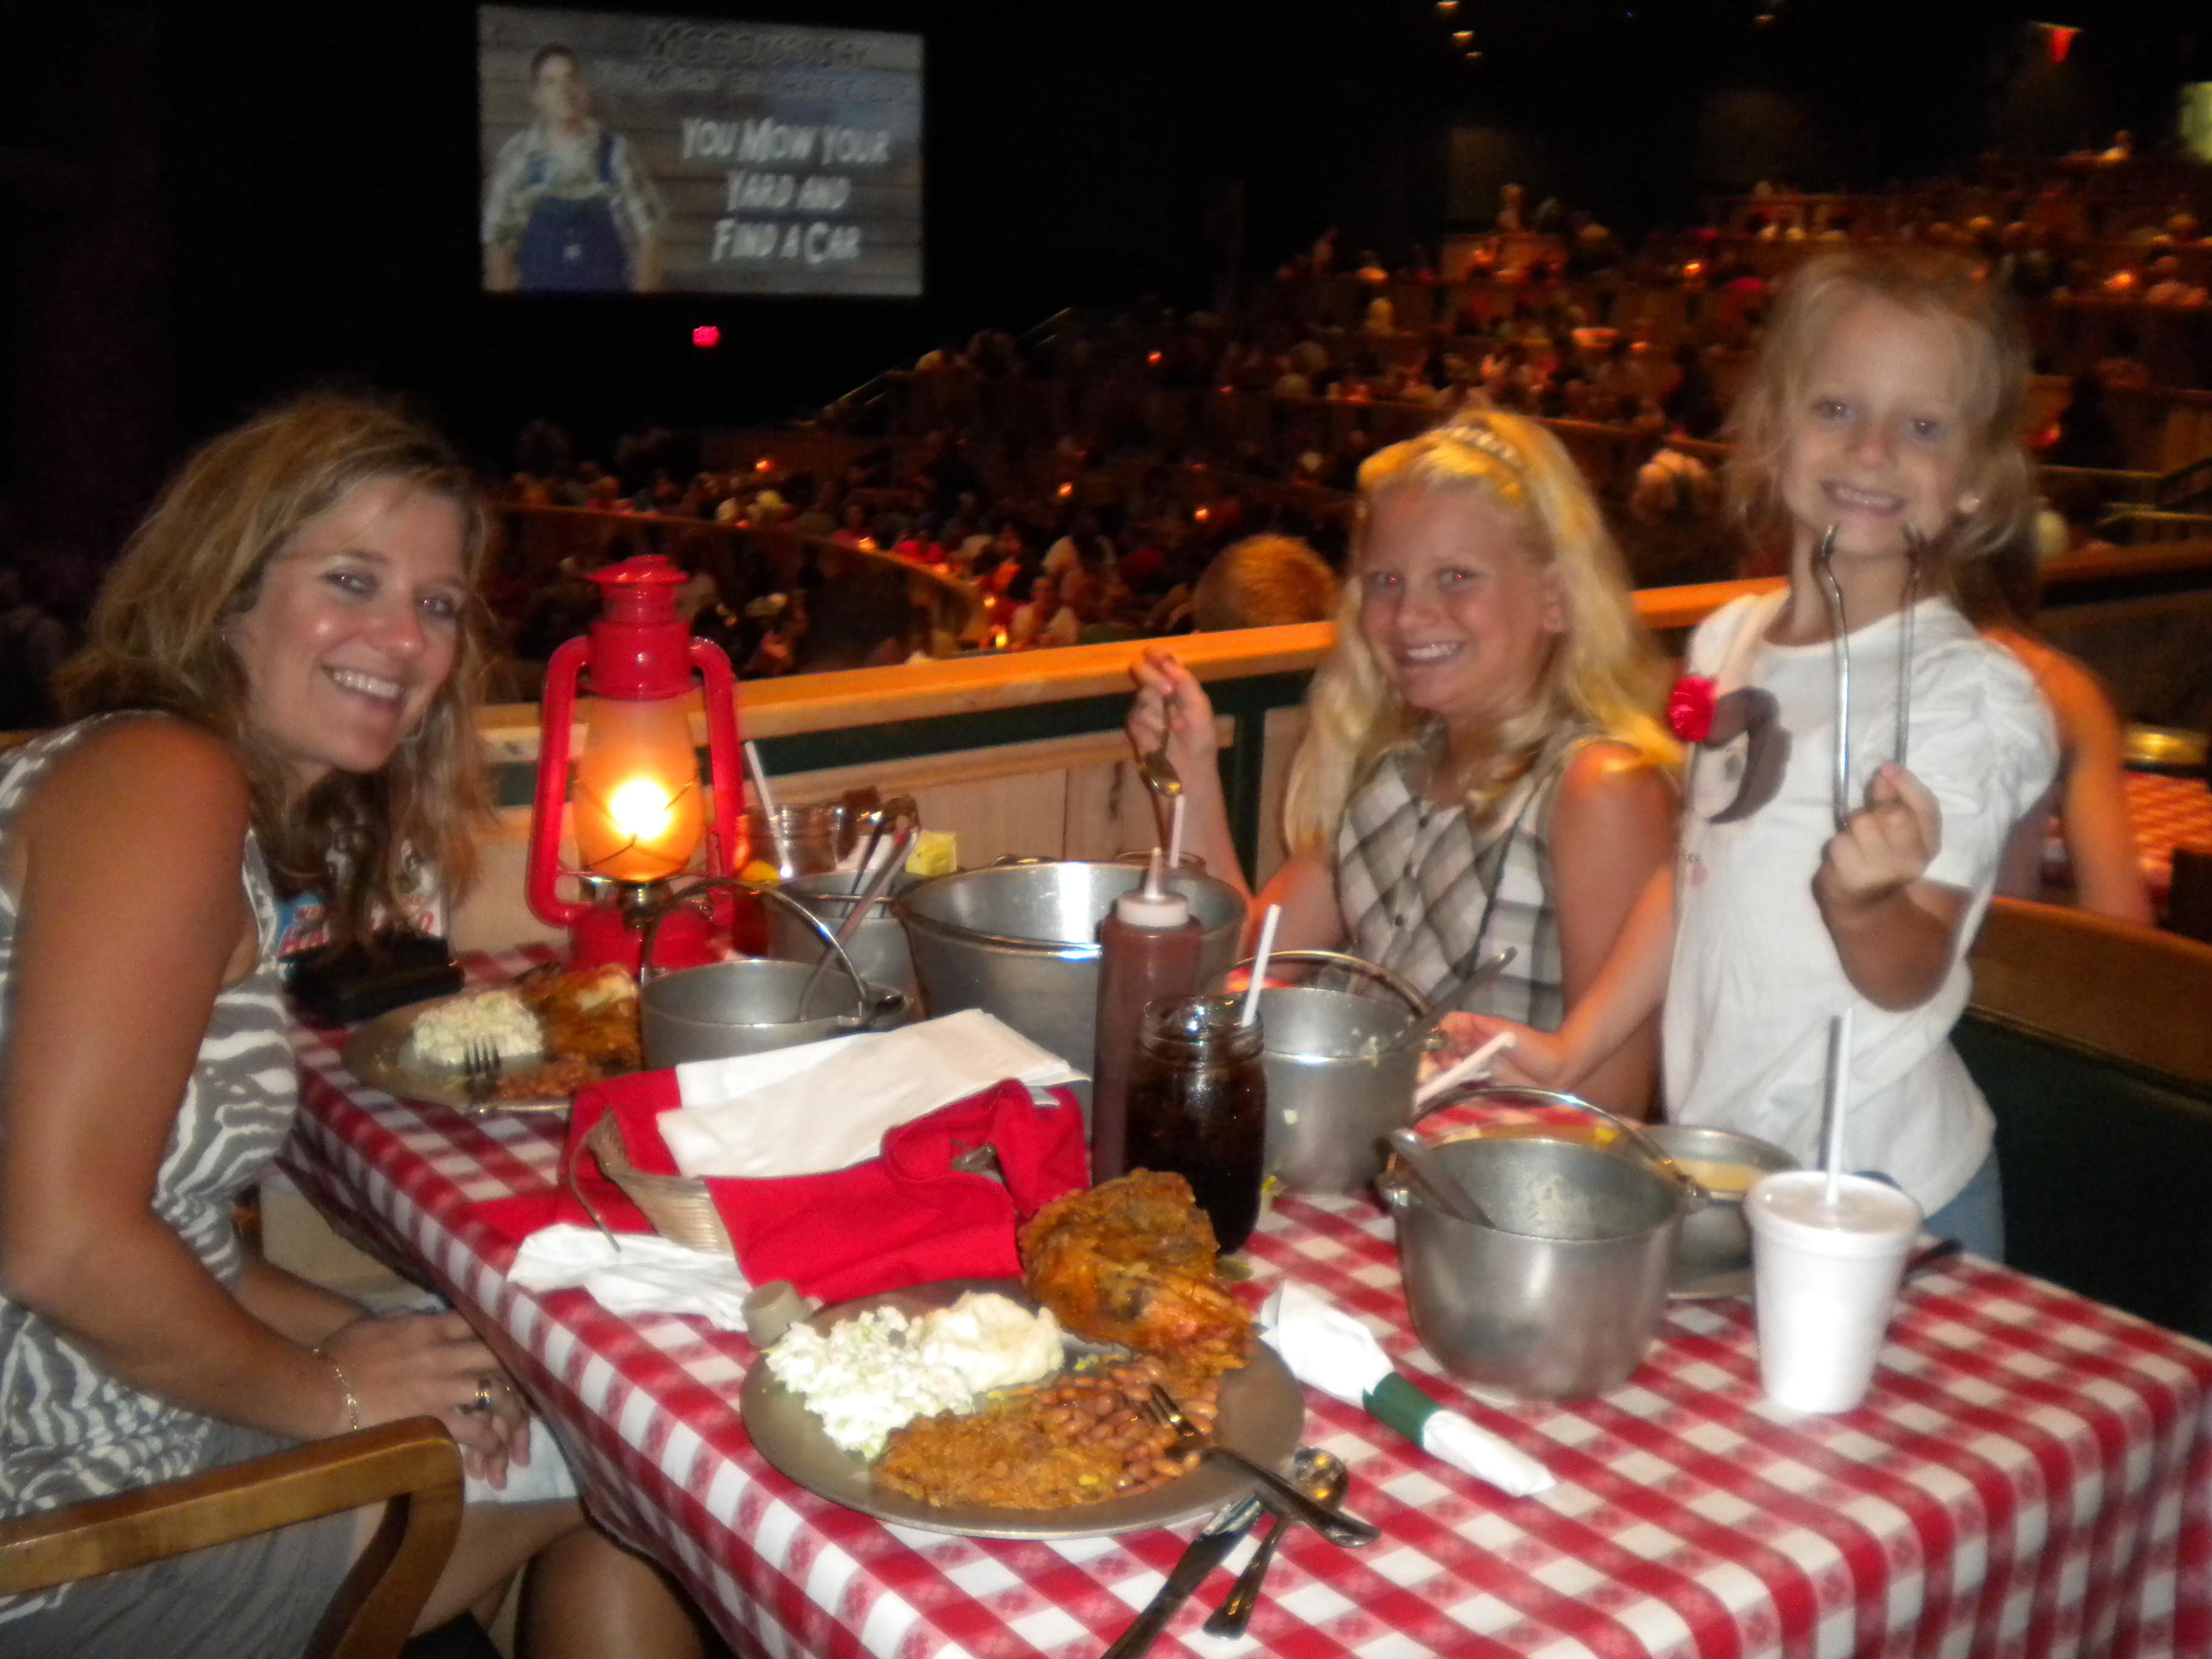 Hatfield & Mccoy Dinner Show  Hatfield and McCoy Dinner Show